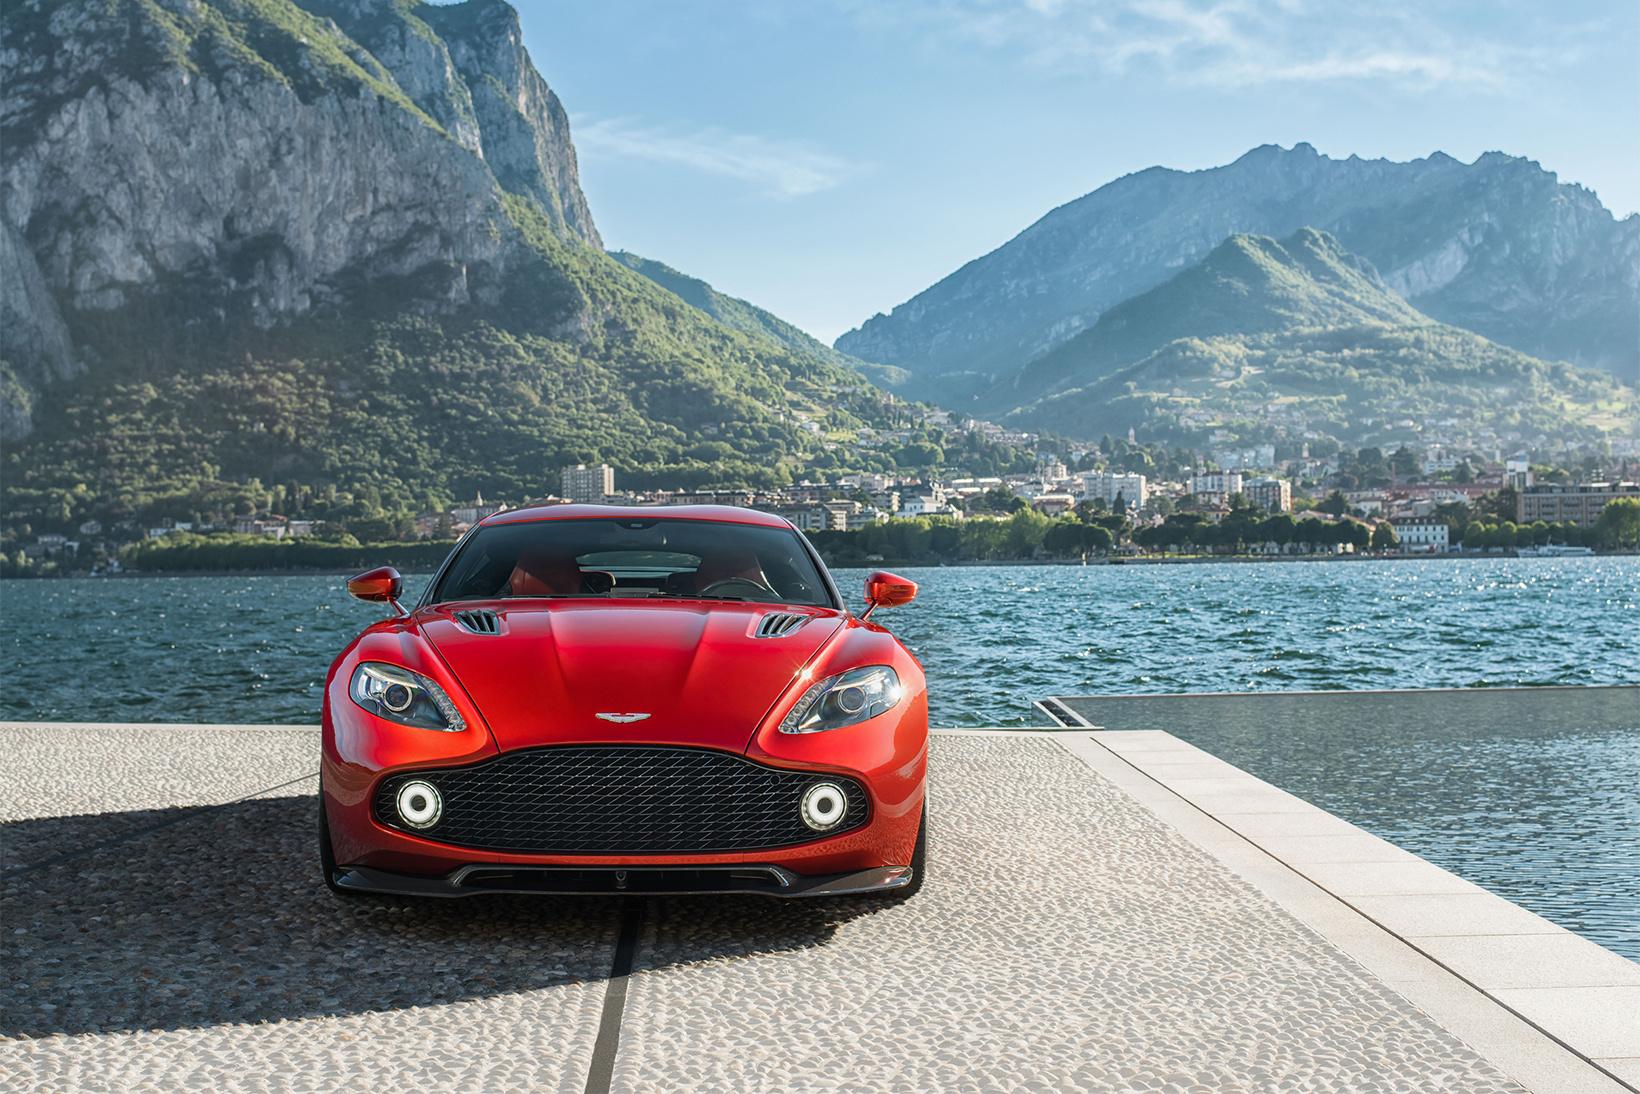 Aston Martin Vanquish Zagato Tech ALL - New aston martin zagato